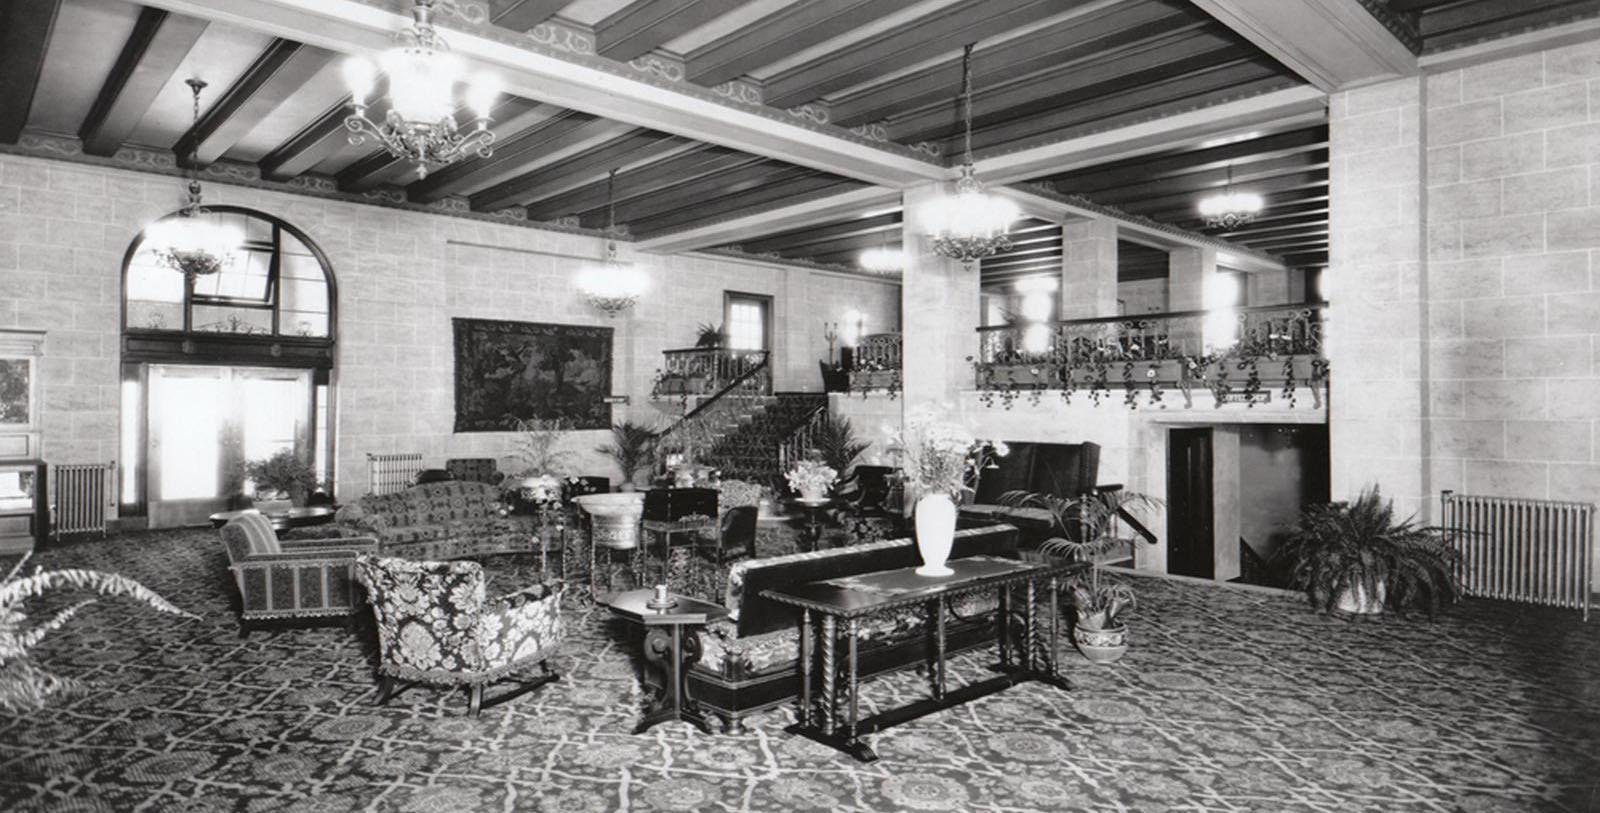 Image of Historic Lobby, Mayflower Park Hotel, Seattle, Washington, 1927, Member of Historic Hotels of America, Discover